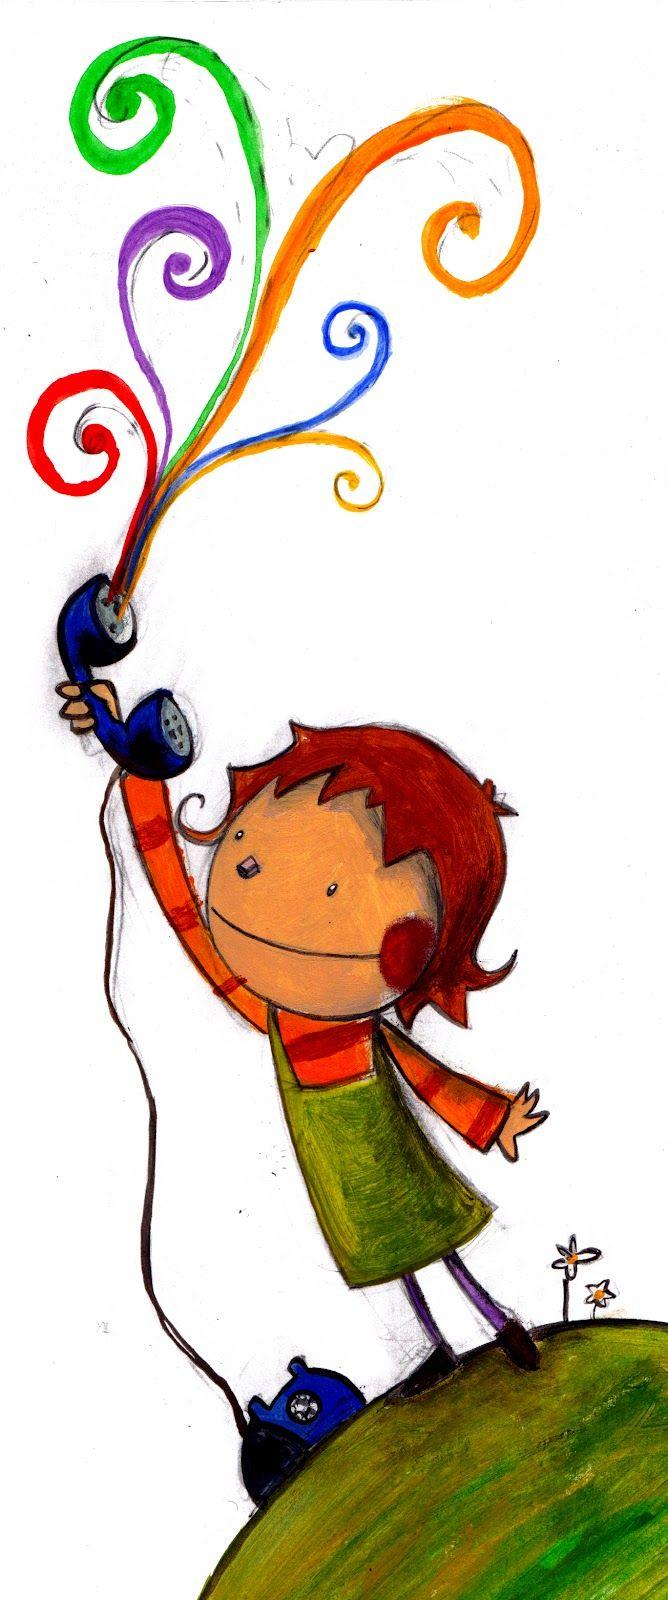 JoAN TuRu [artista de revista] Pel Telèfon de l'Esperança. Puedes ver mucho más sobre familia y bebes en www.solerplanet.com